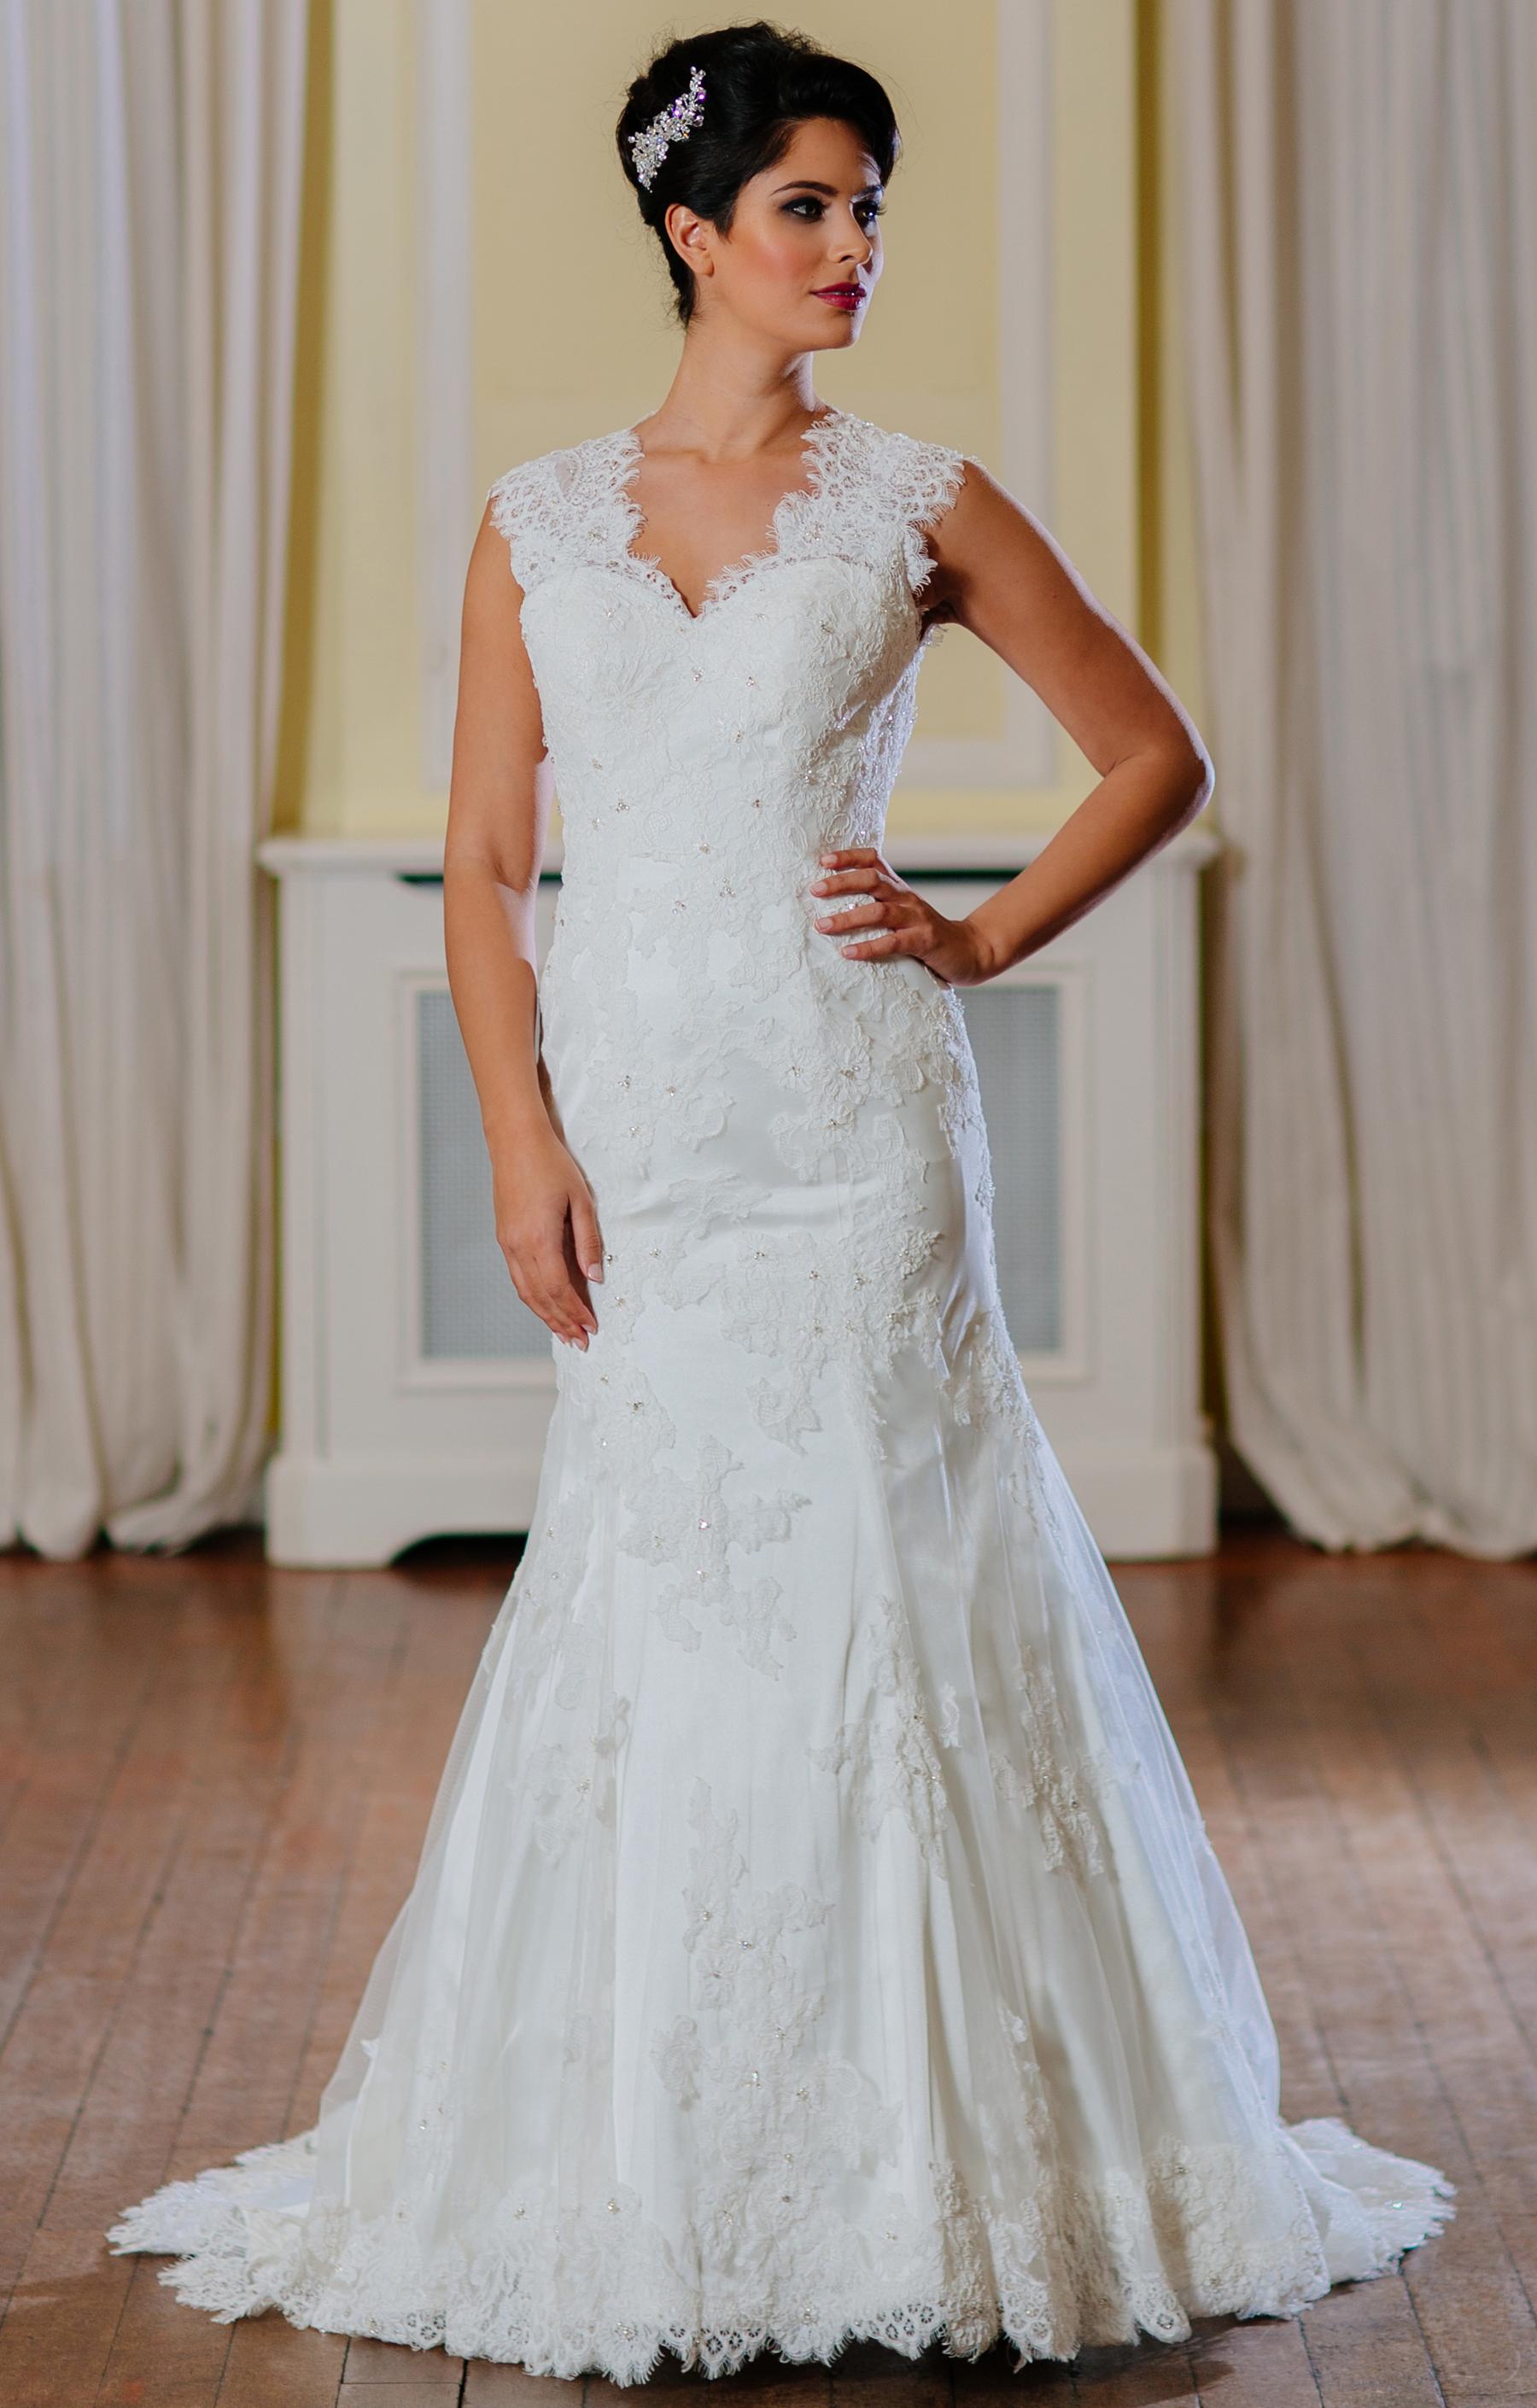 Plus Size Wedding Dresses Lincoln Ne: Prom dresses lincoln ne red ...